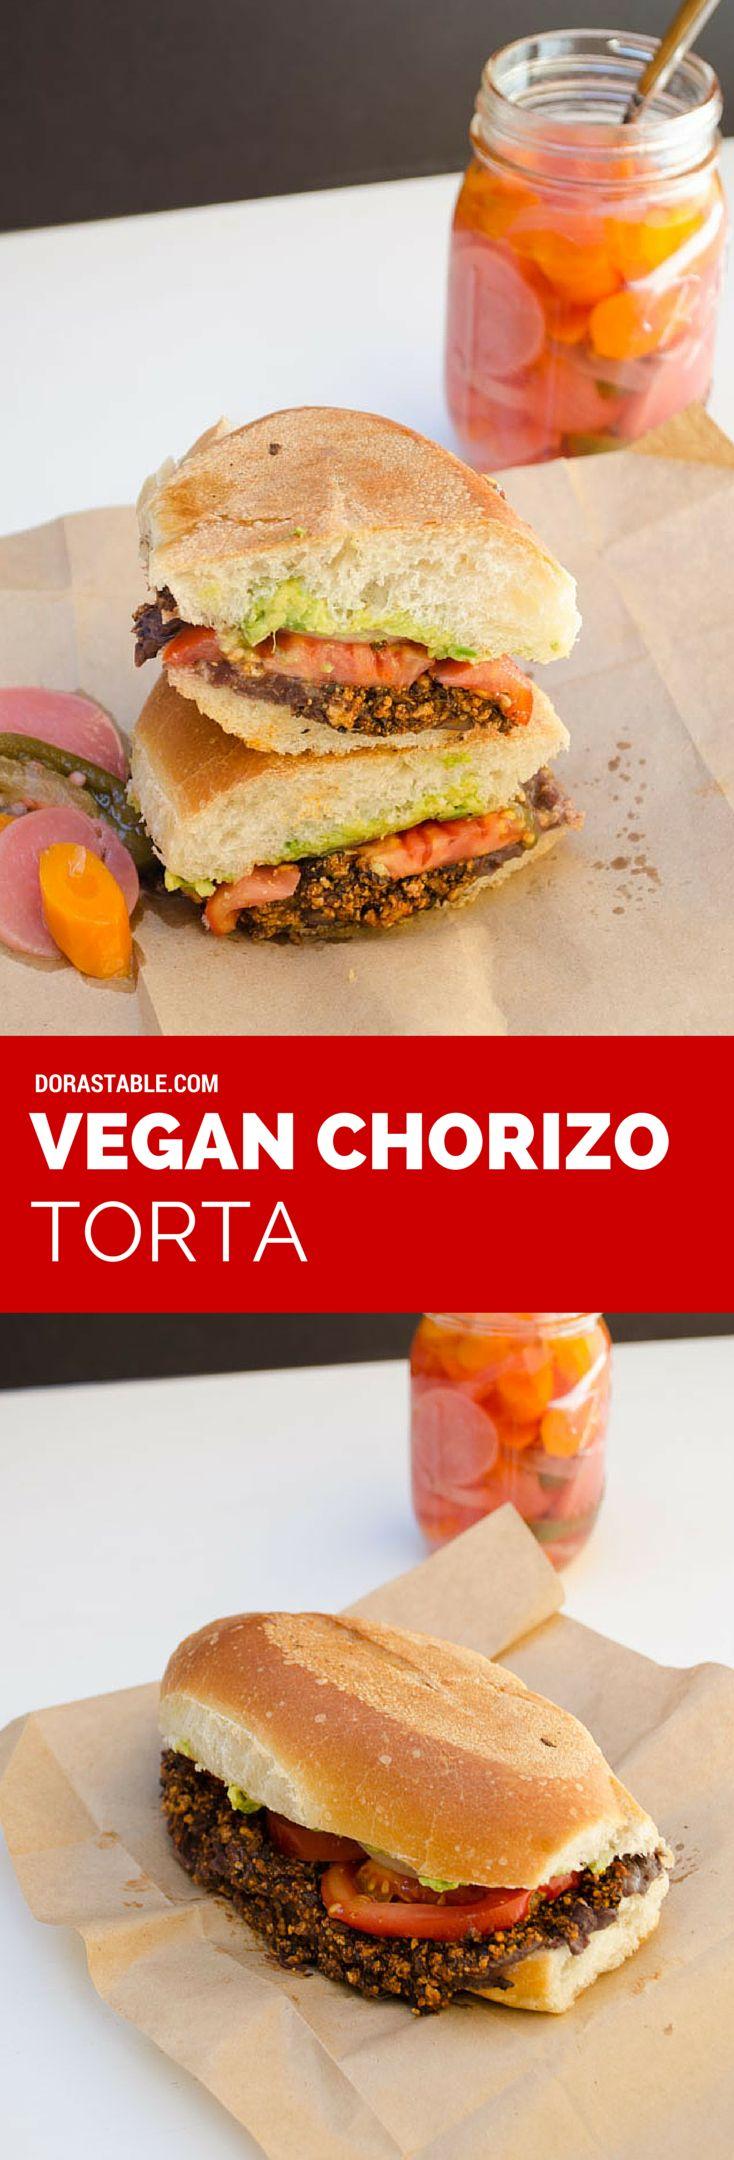 Vegan chorizo torta, spicy, creamy, crispy and easy to make #veganmexican